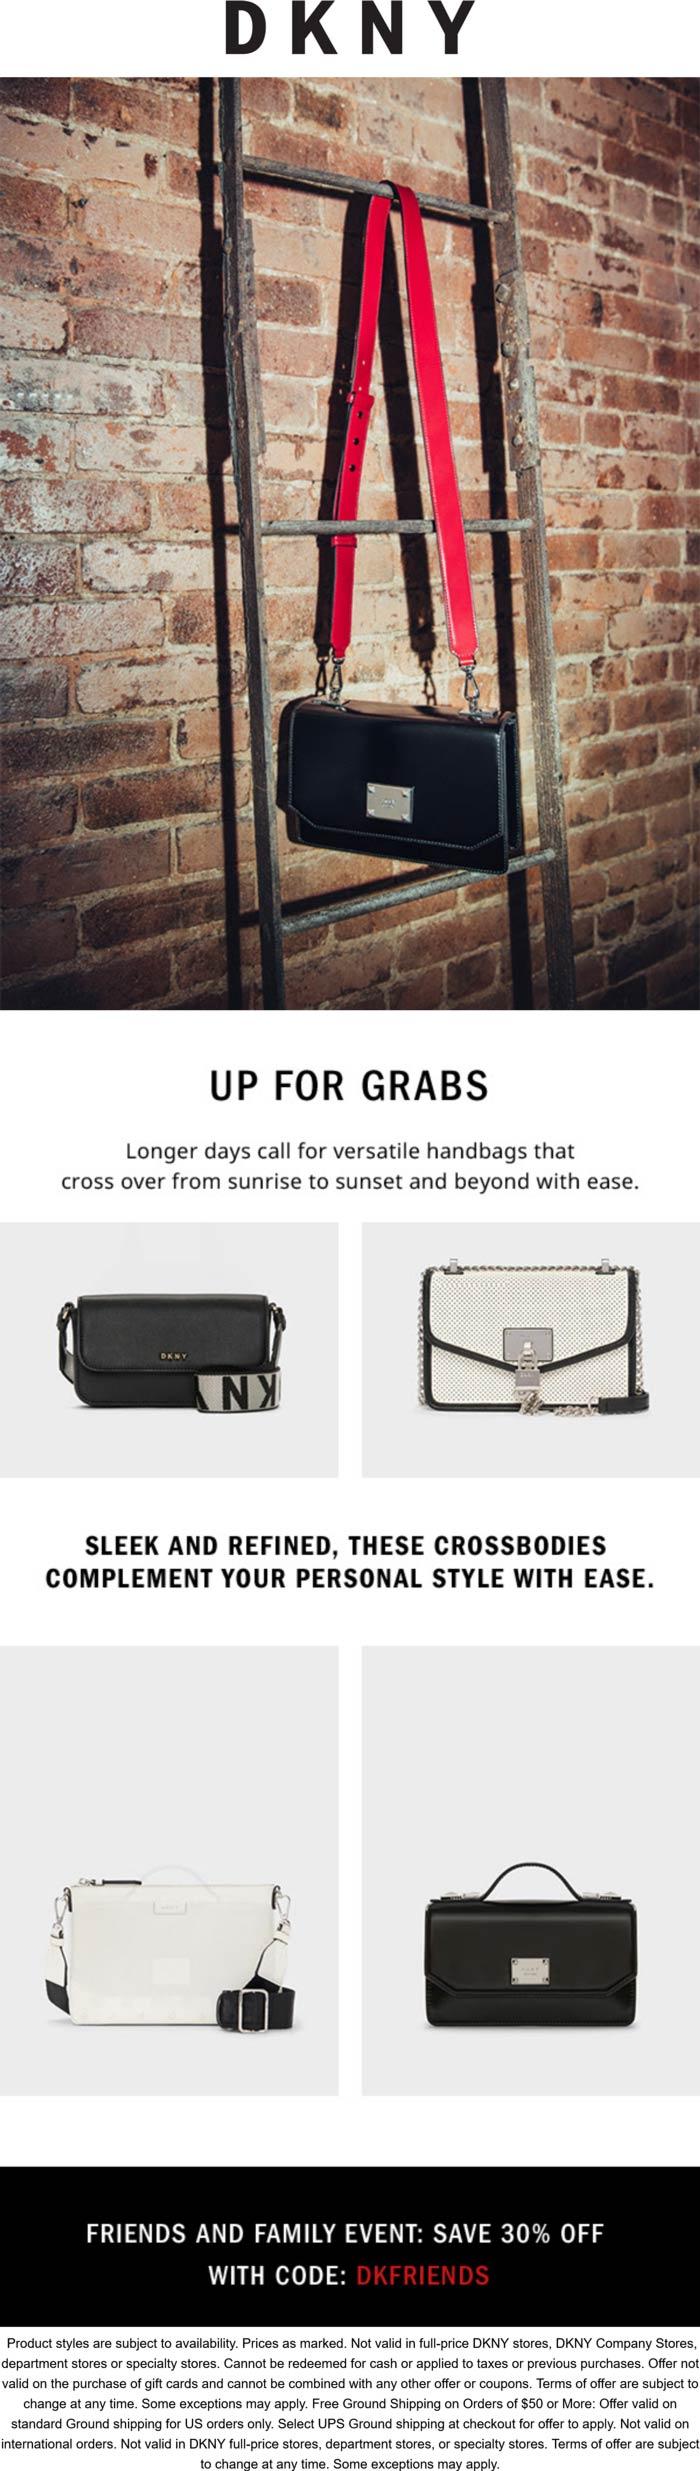 DKNY stores Coupon  30% off at DKNY via promo code DKFRIENDS #dkny